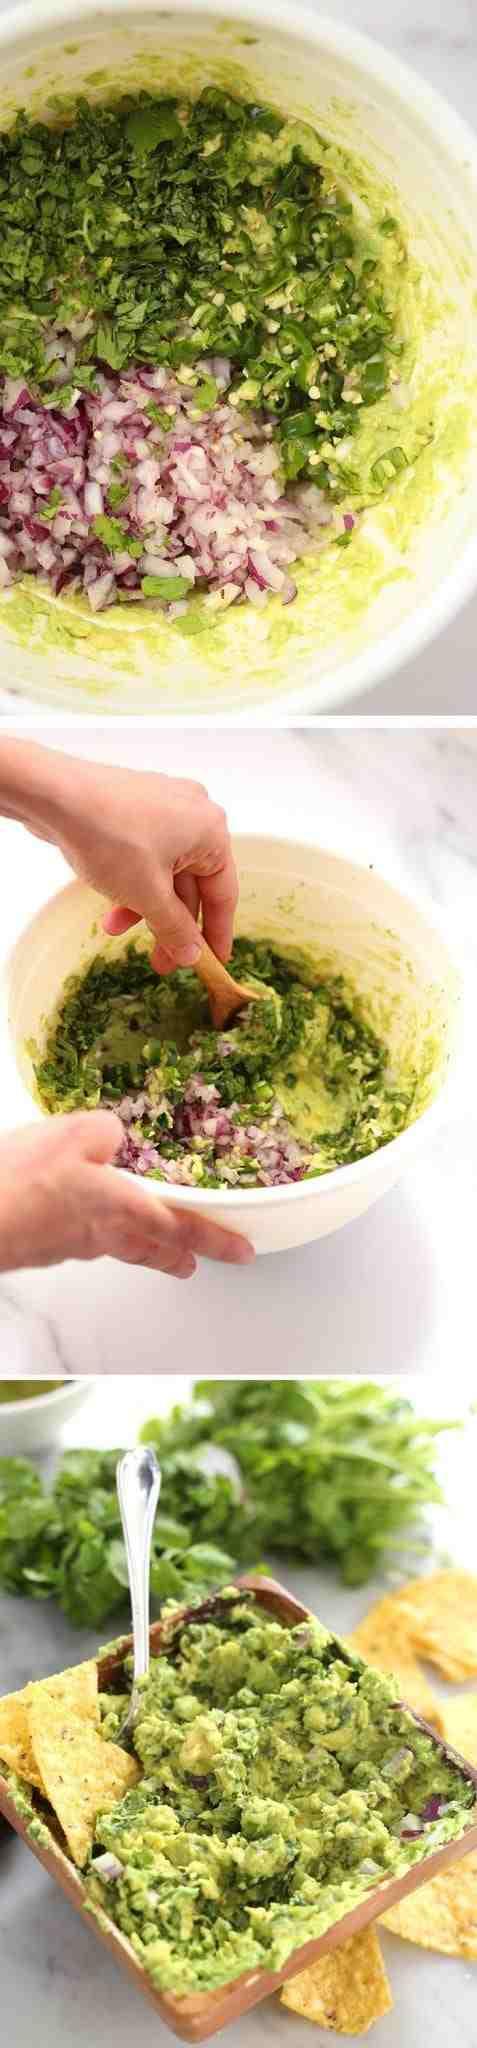 Traditional-Guacamole-5